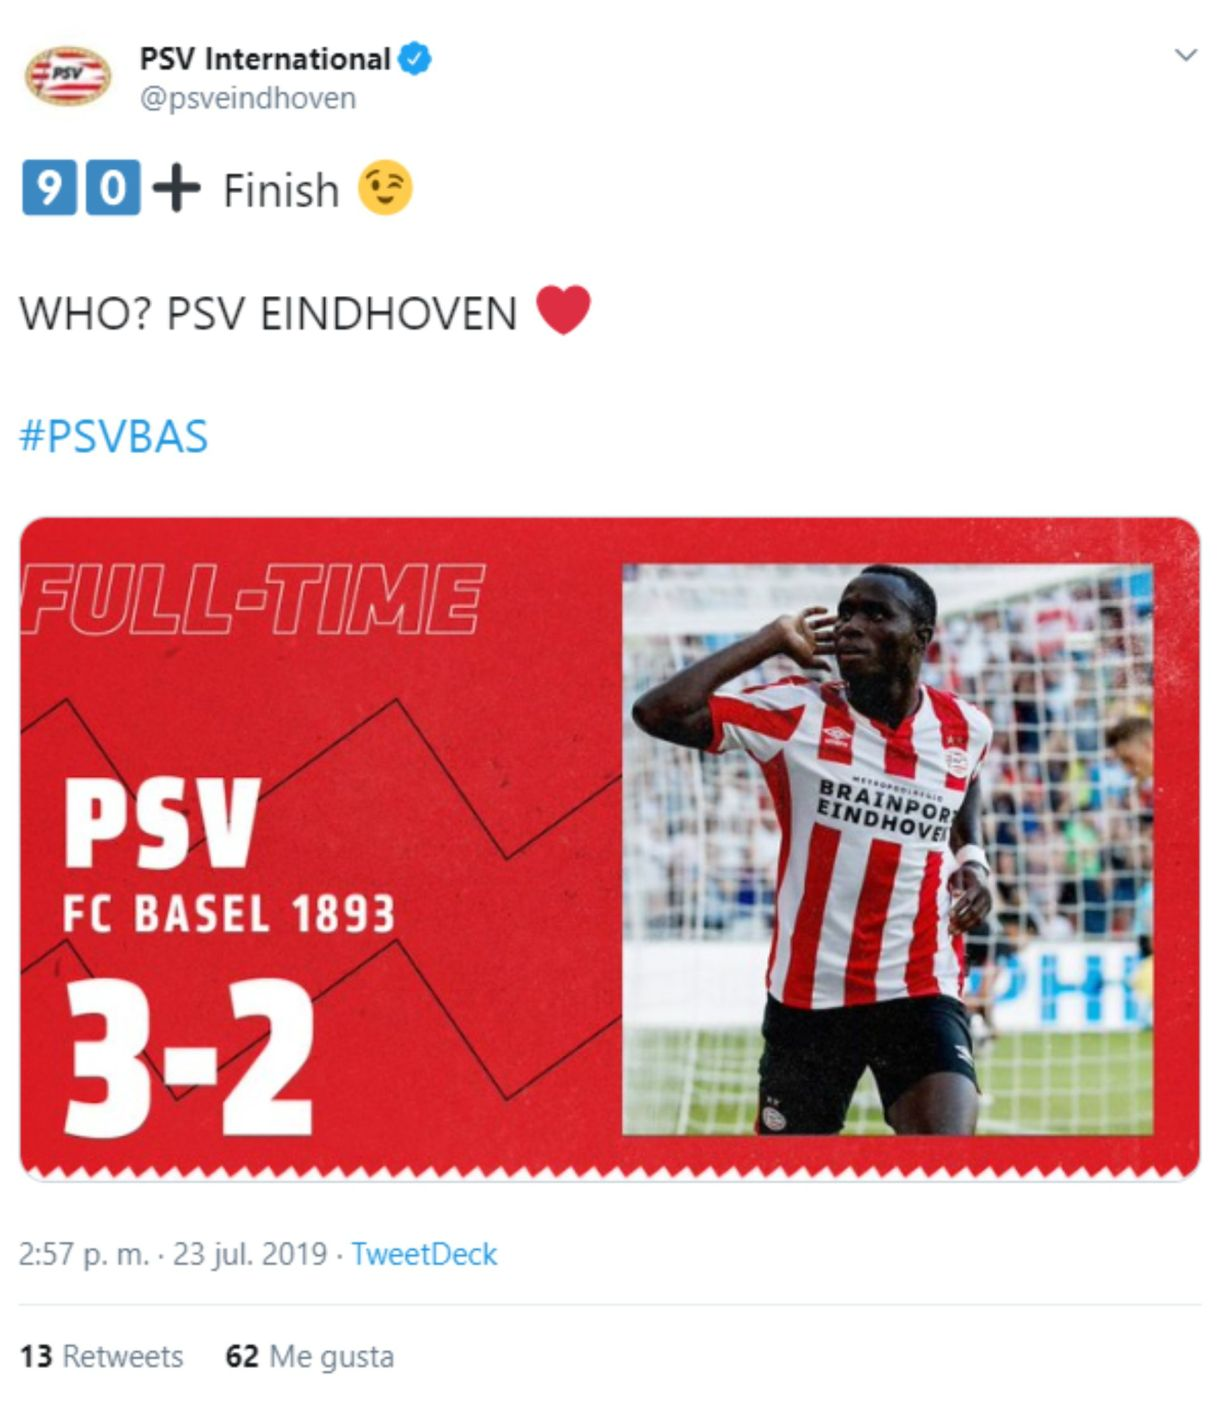 El equipo holandés se llevó la victoria en la ida de este cruce, en busca de un boleto a la fase de grupos de la Champions (Foto: Captura de pantalla de Twitter)